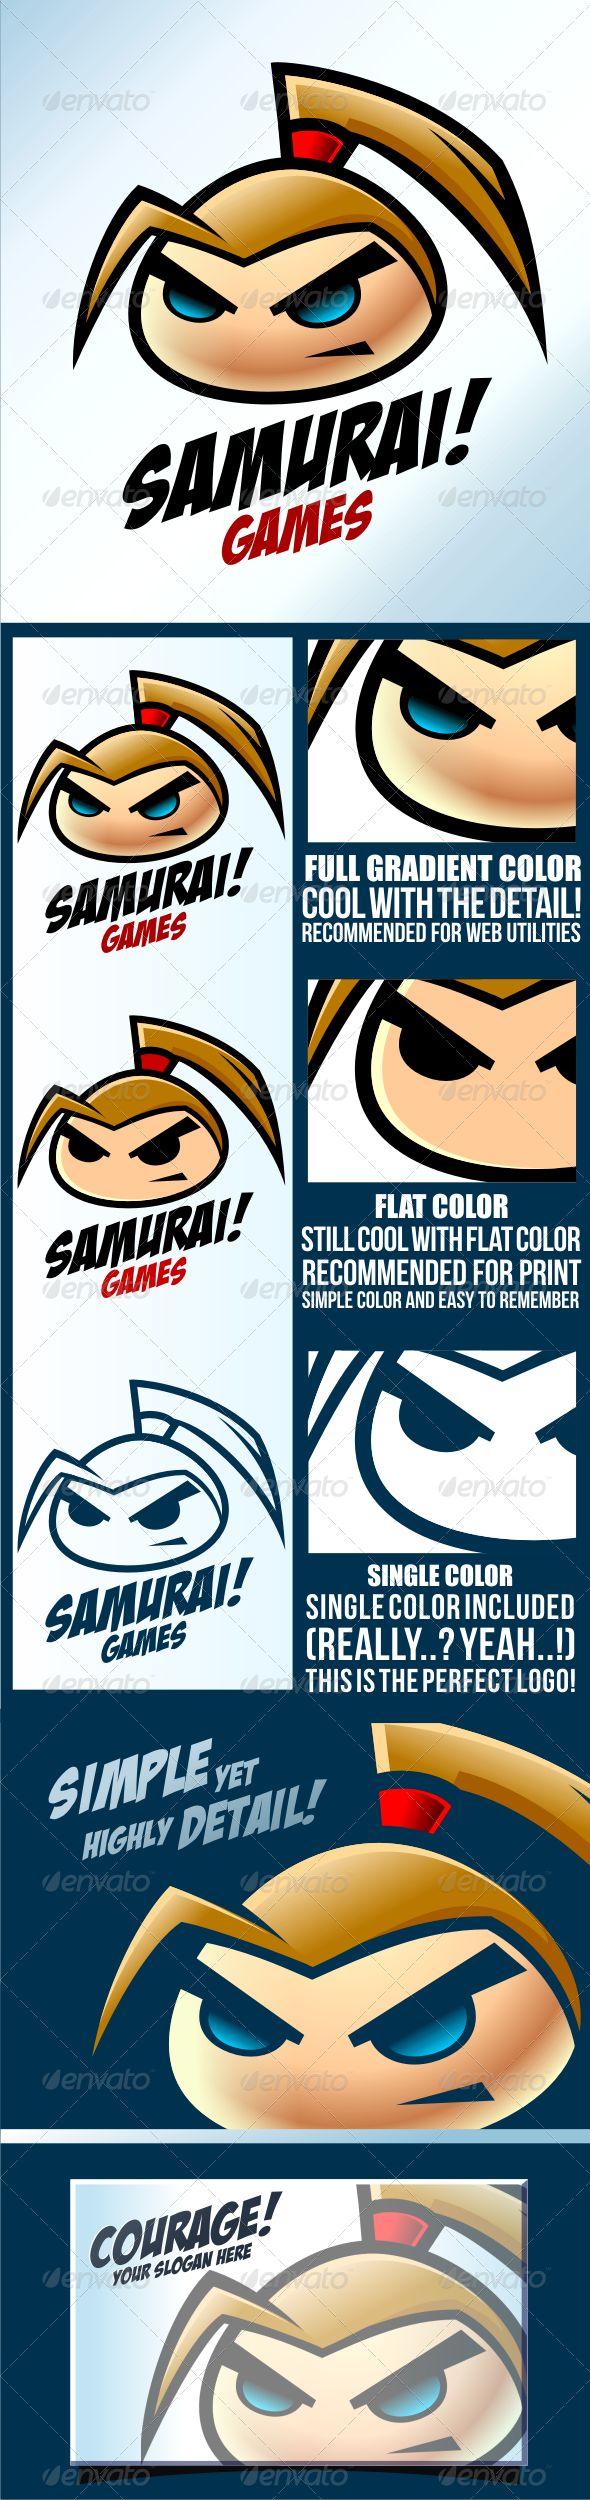 Samurai Game Logo Design Template Vector #logotype Download it here: http://graphicriver.net/item/samurai-game/3559312?s_rank=416?ref=nexion